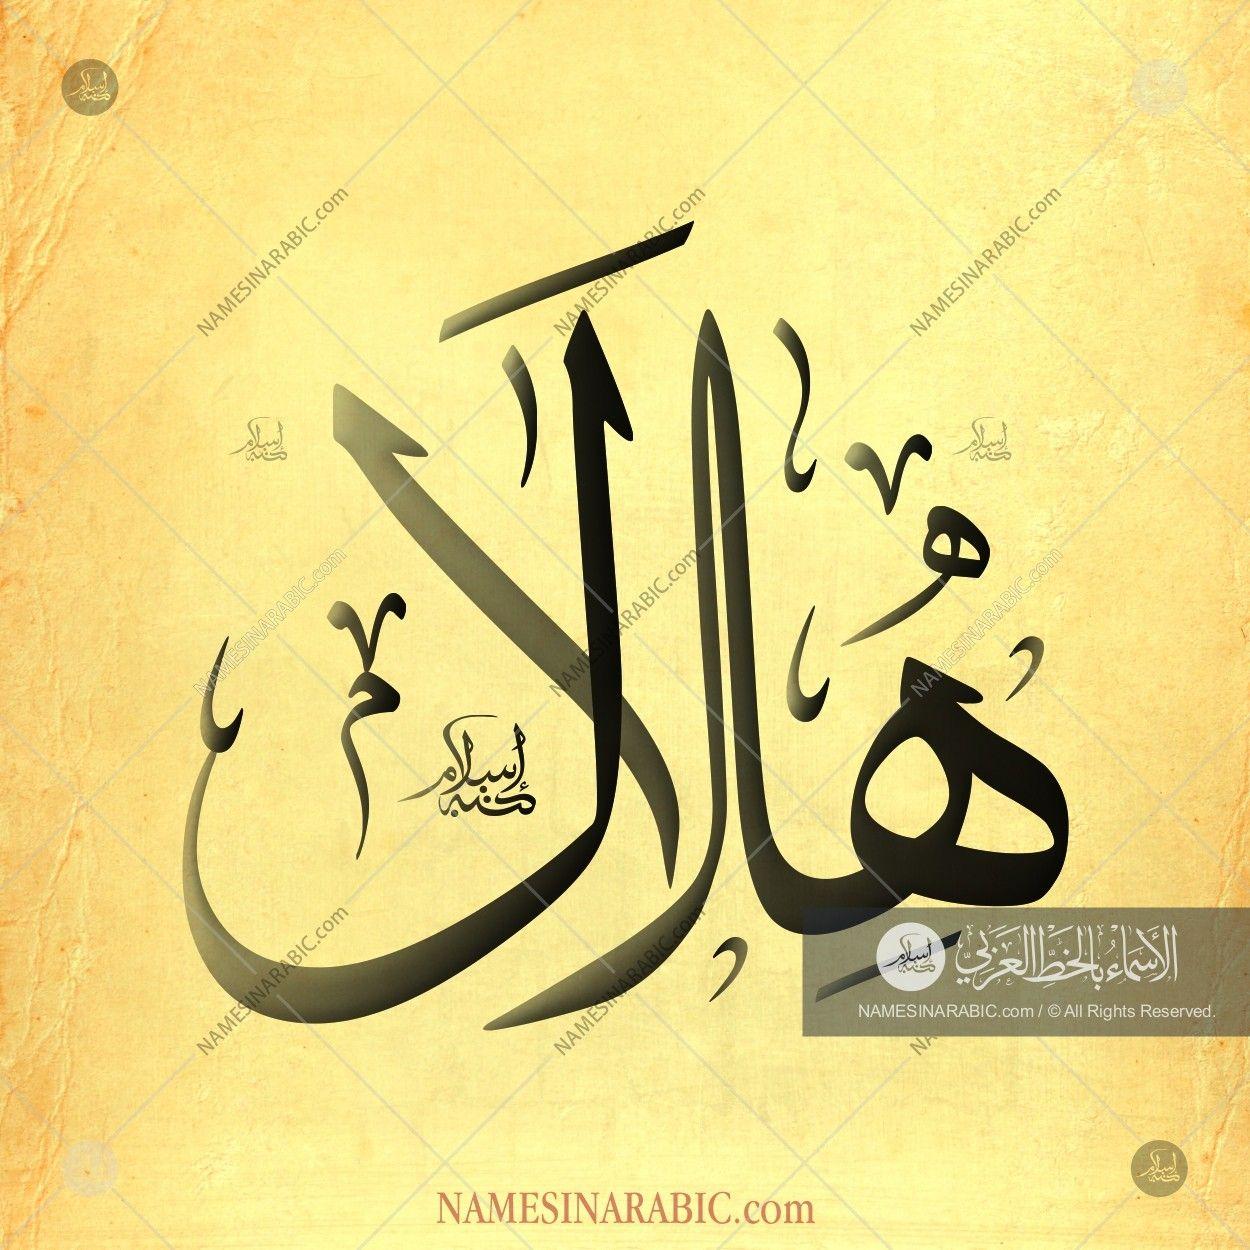 Hilal هلال Names In Arabic Calligraphy Name 1839 Calligraphy Calligraphy Name Arabic Calligraphy